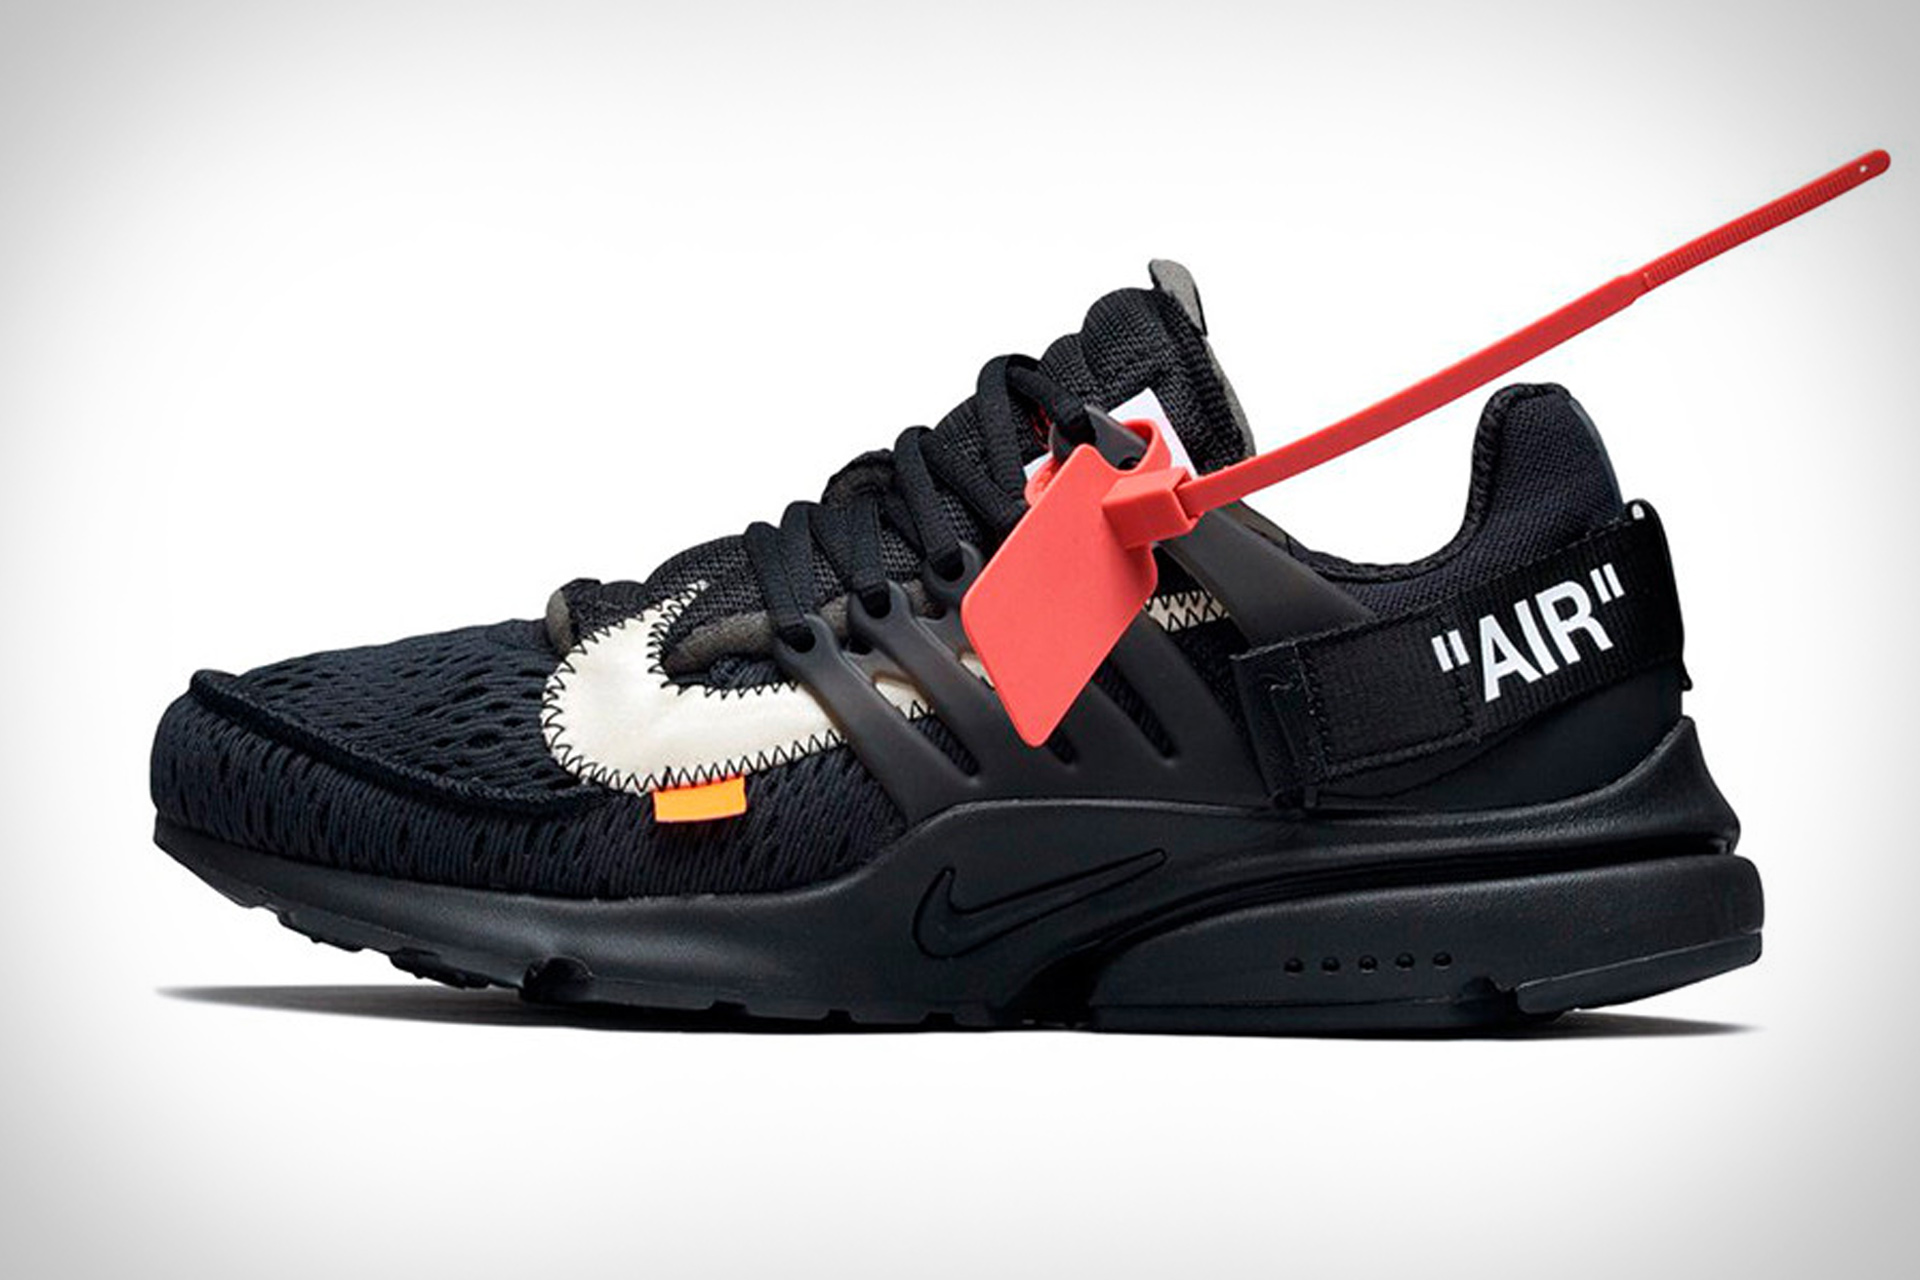 Nike x Off-White Air Presto Sneaker